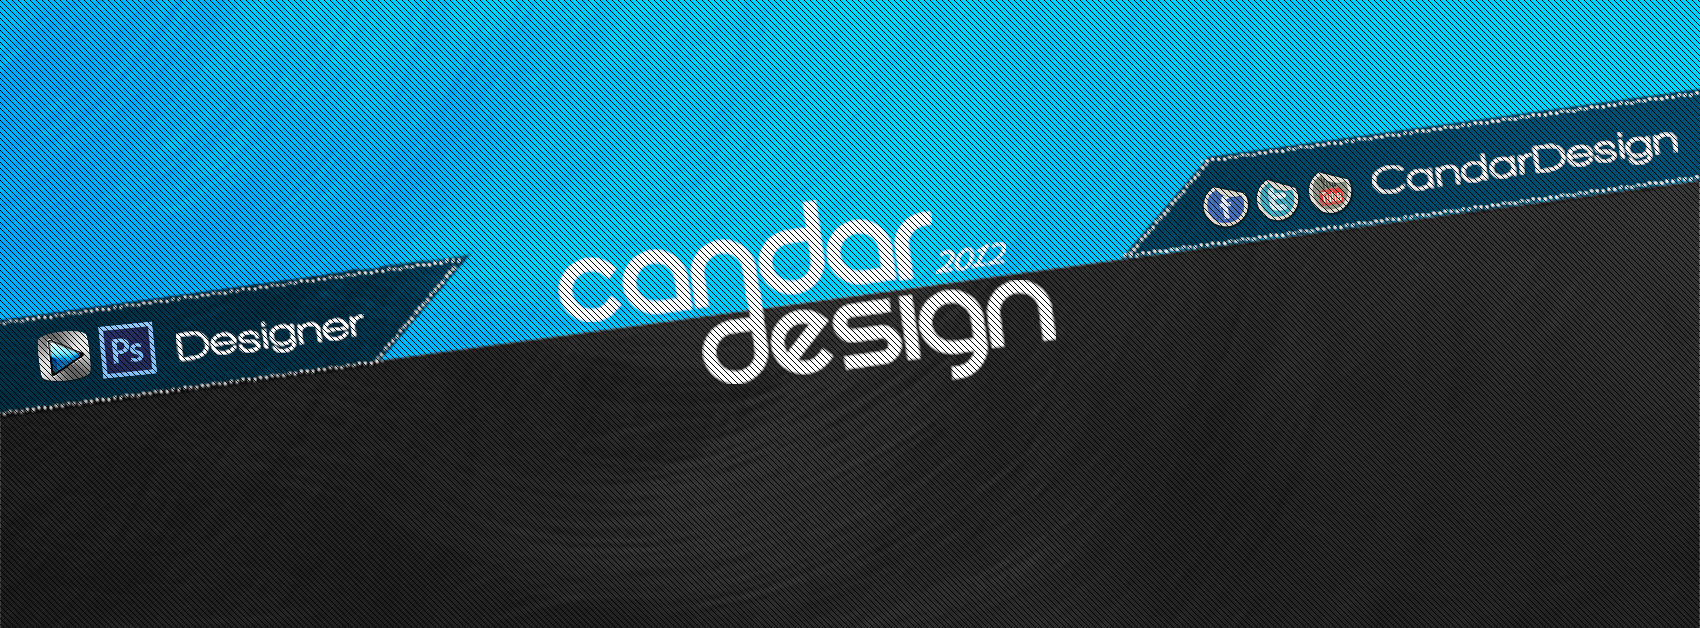 candardesign | Explore candardesign on DeviantArt